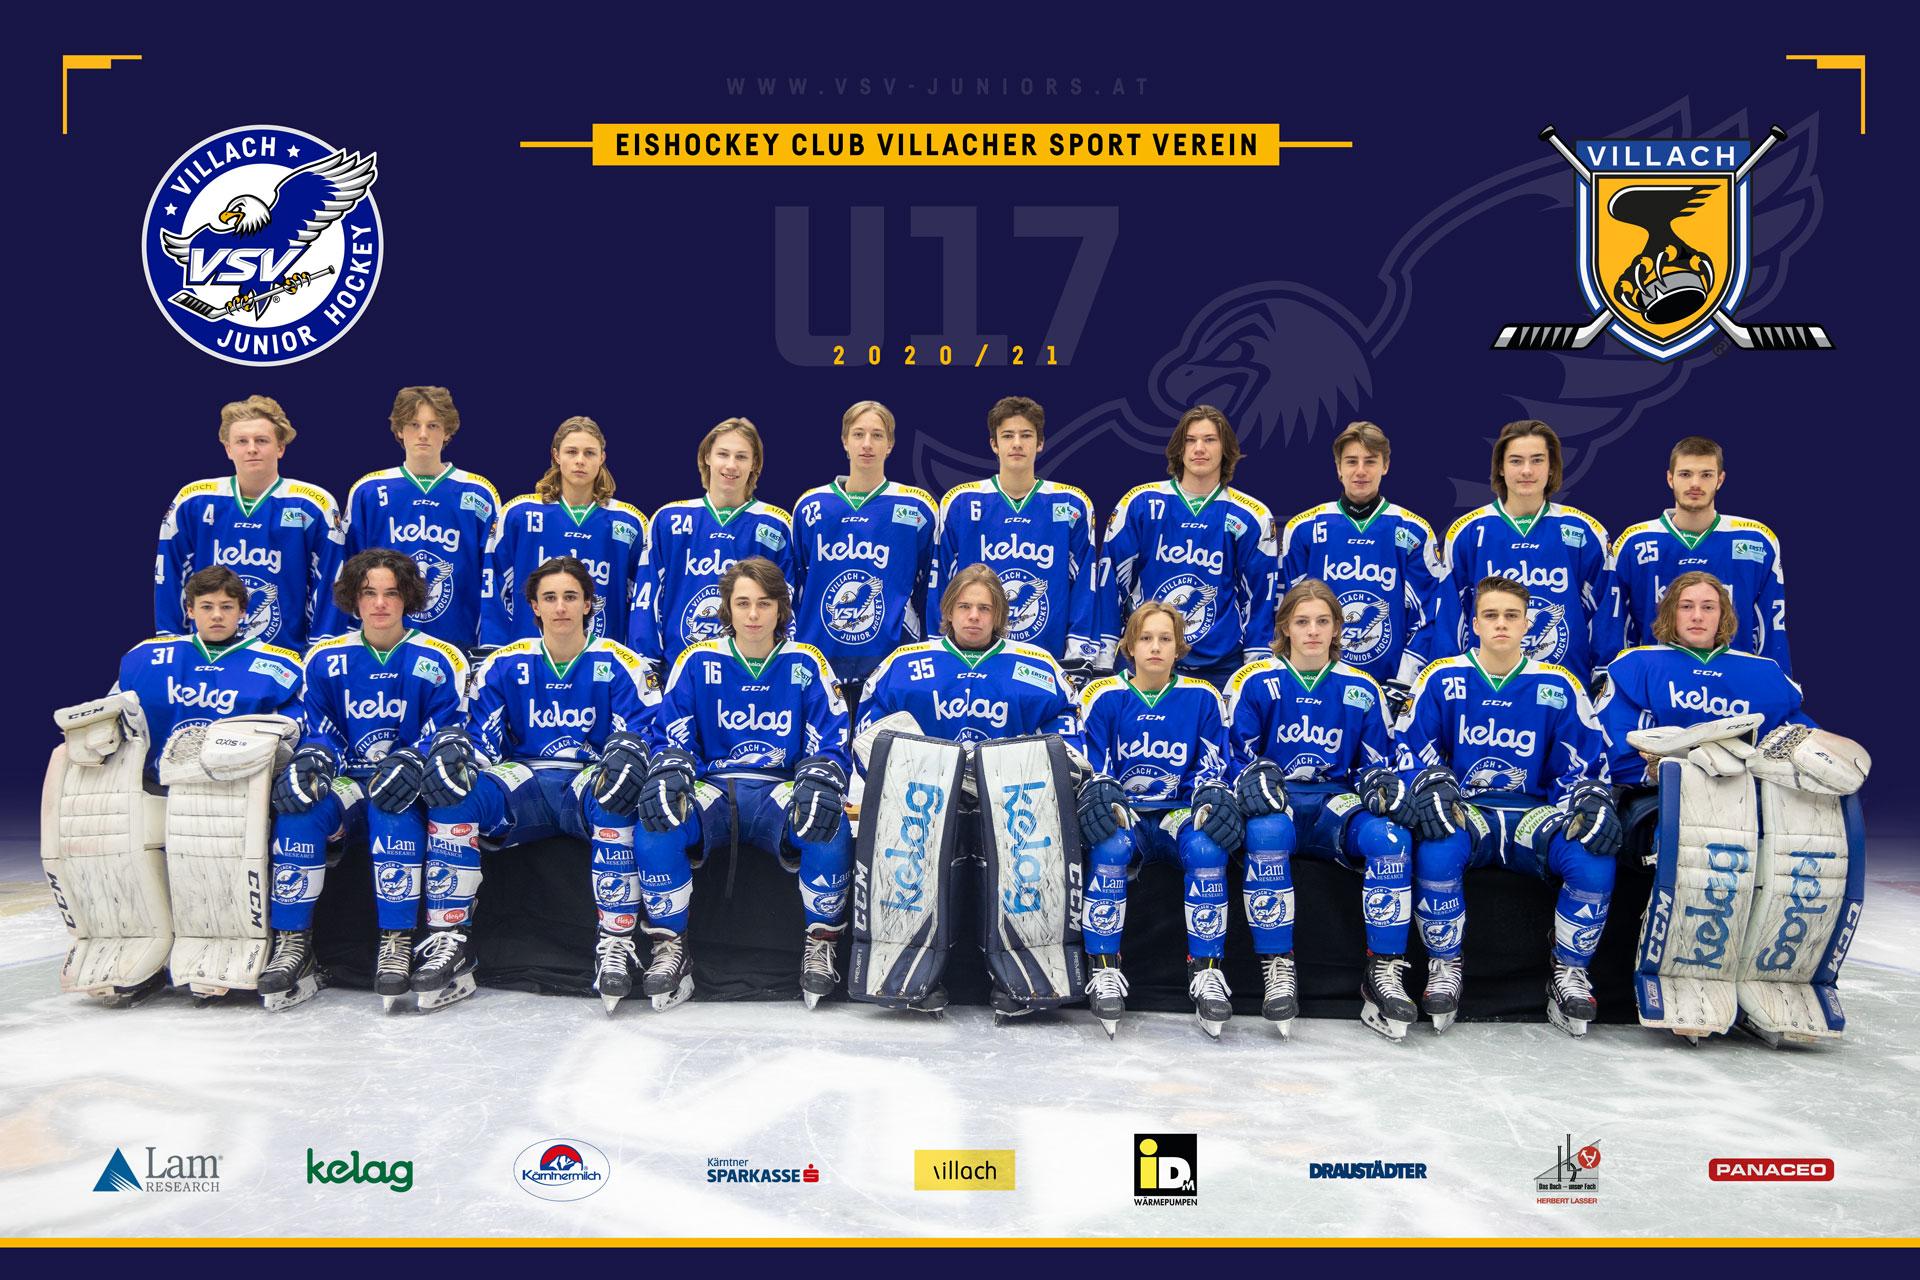 EC VSV U17 2020-21